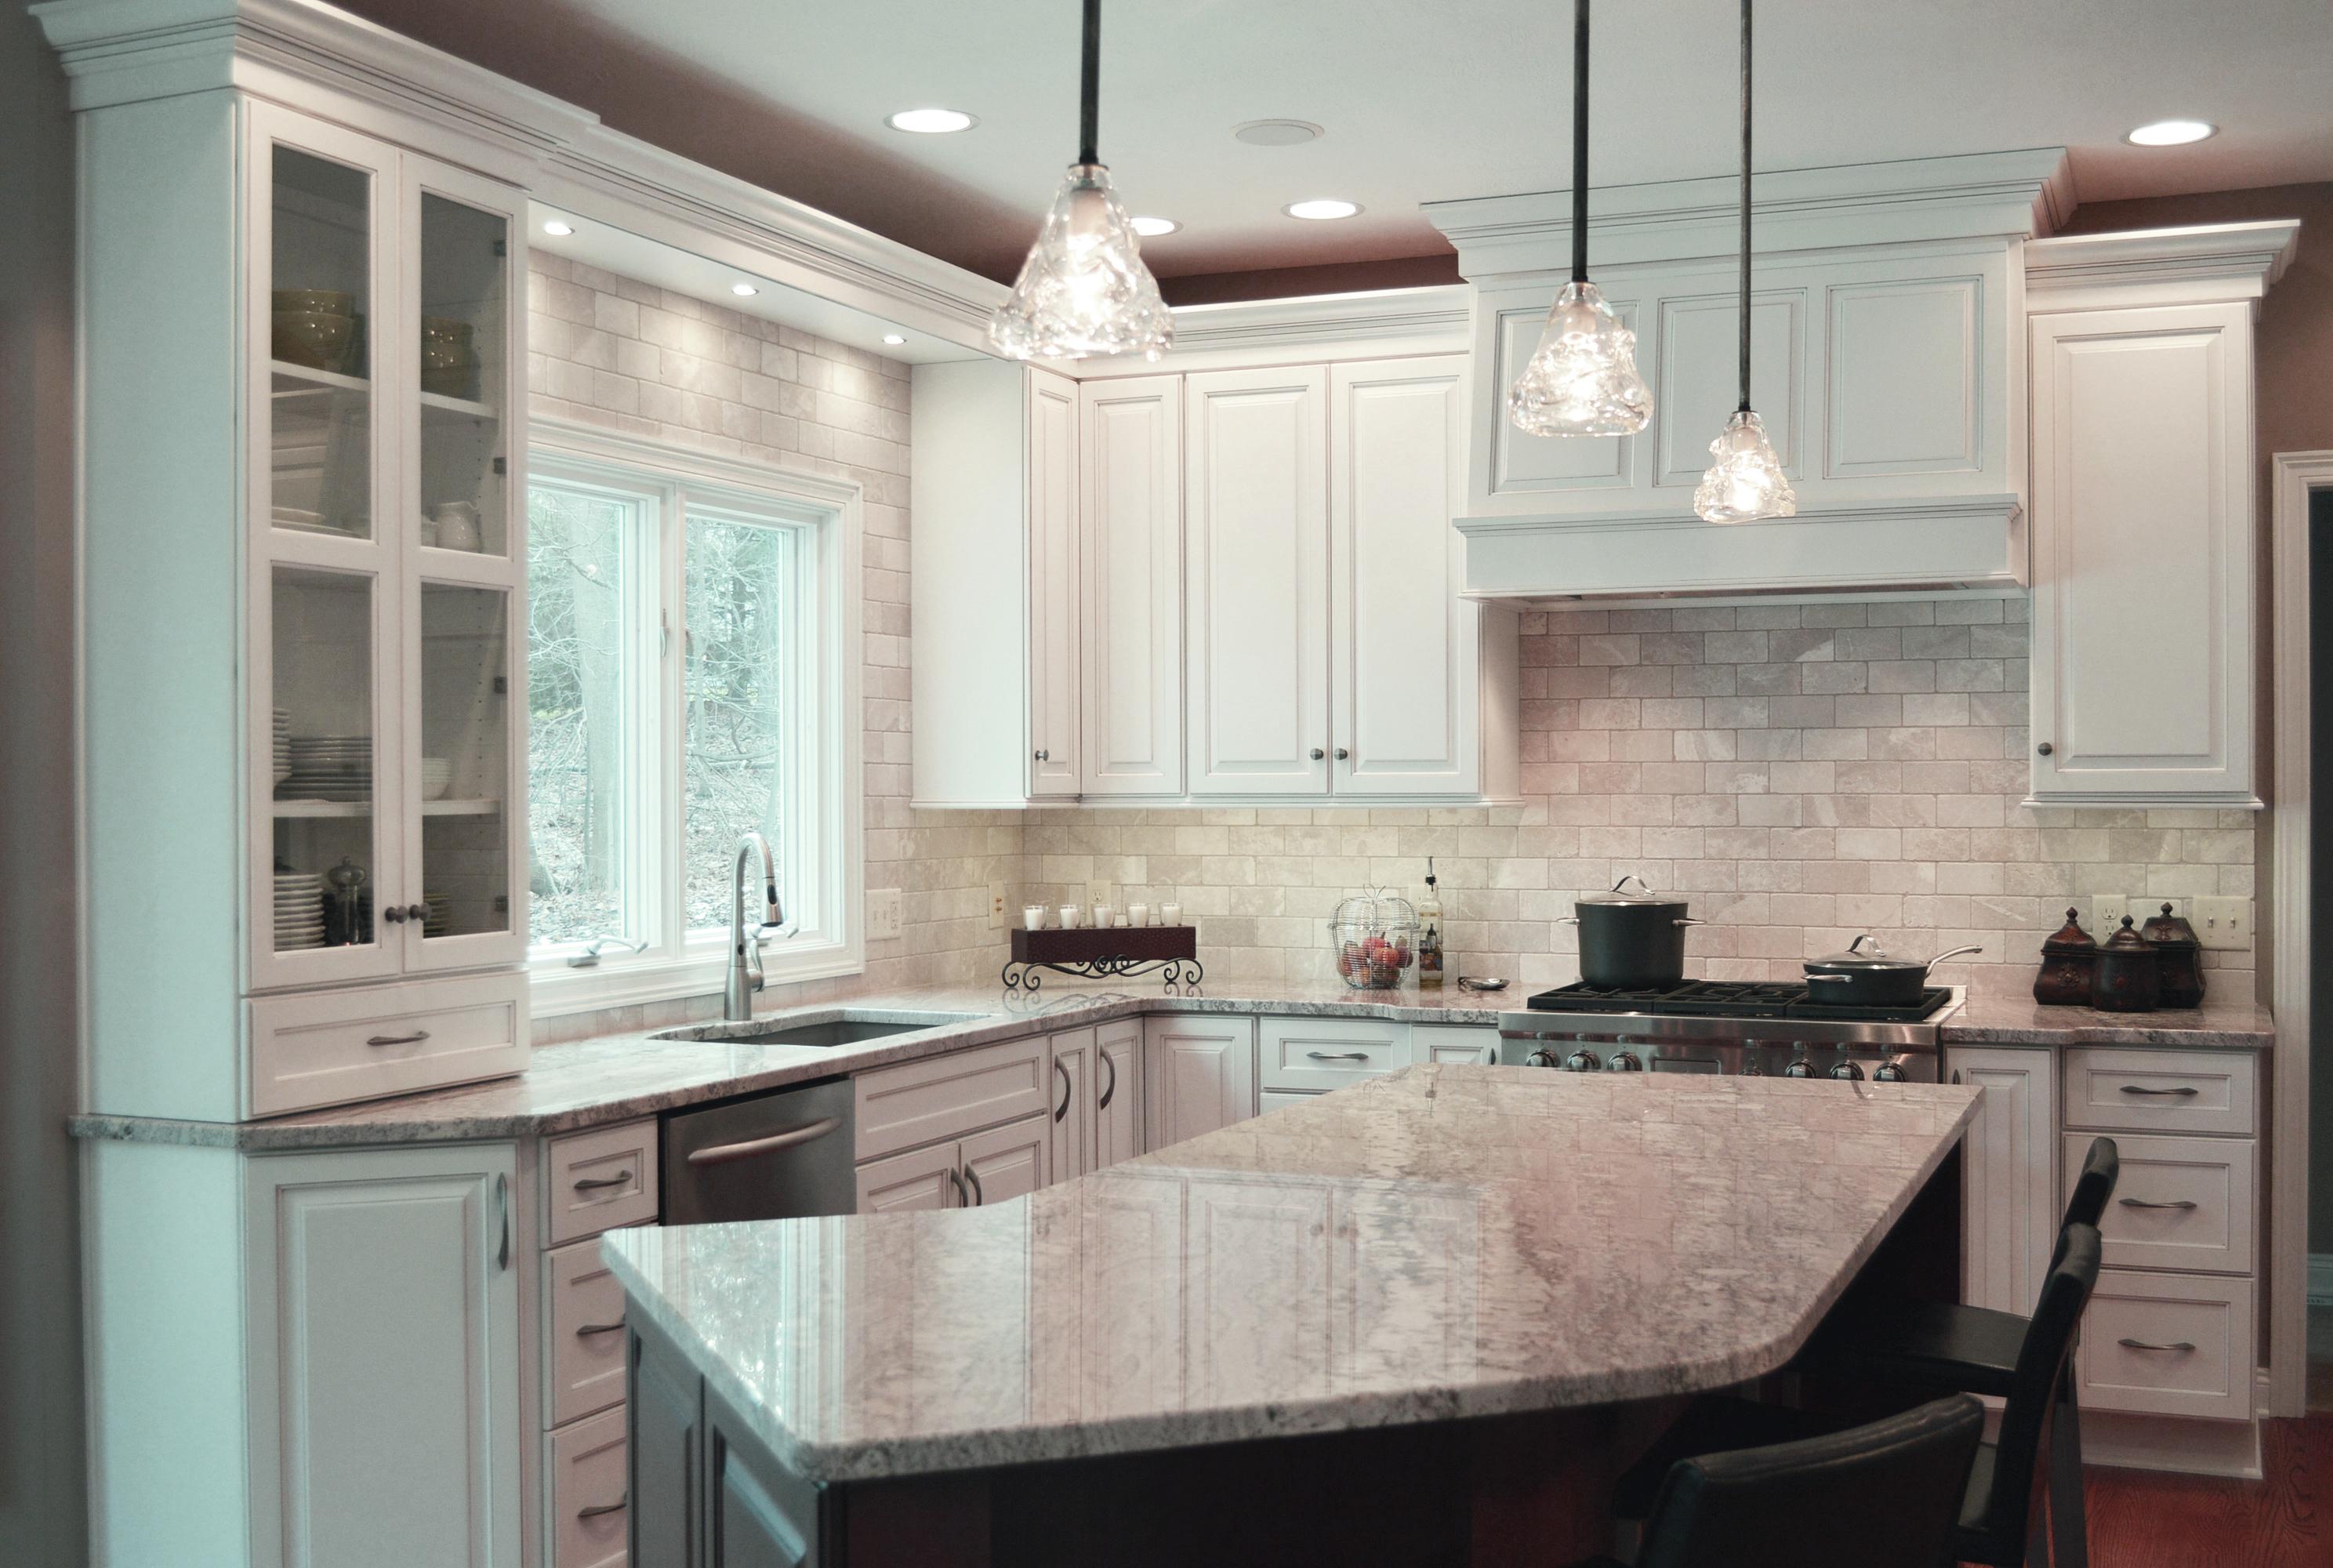 White kitchens with white appliances - White Kitchen Cabinets